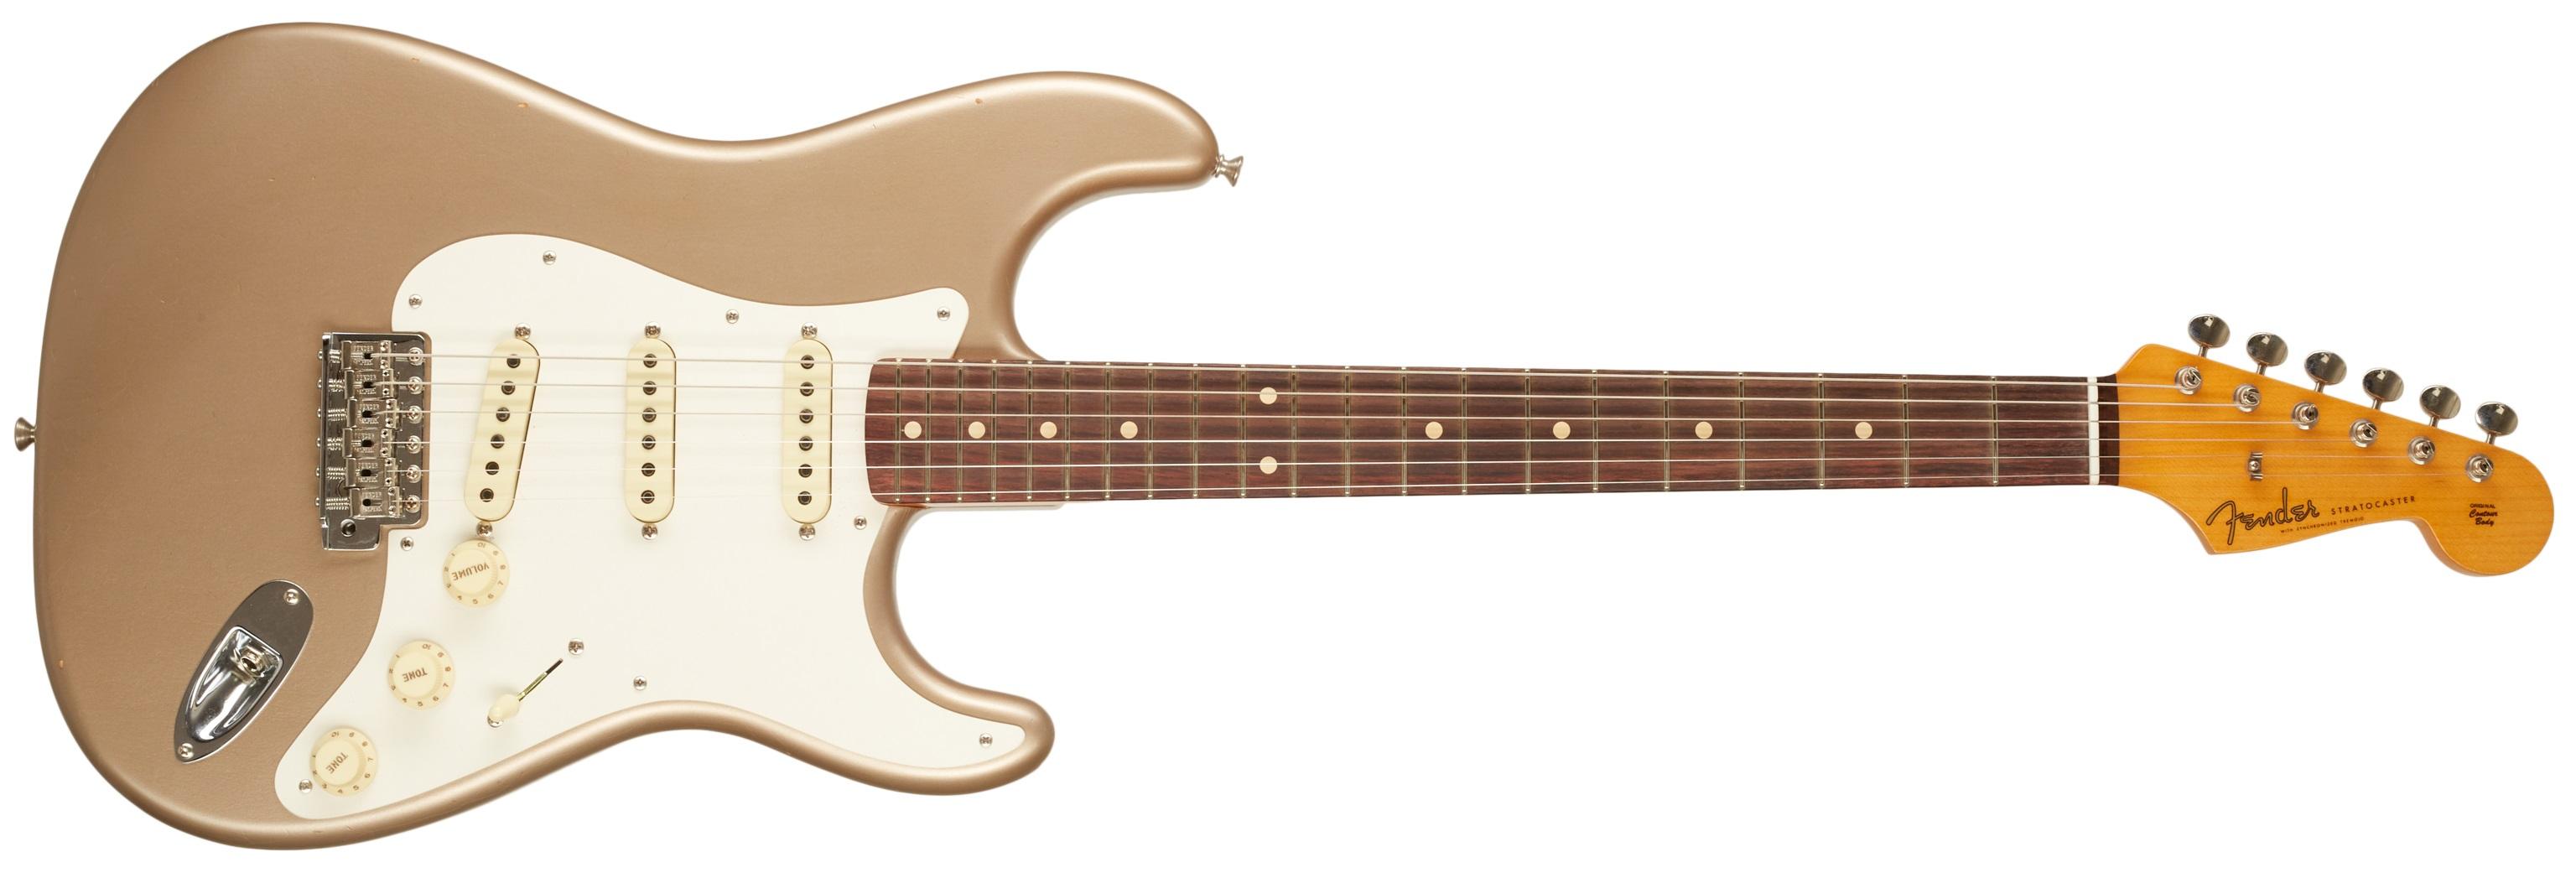 Fender 1959 Stratocaster Journeyman Relic SG